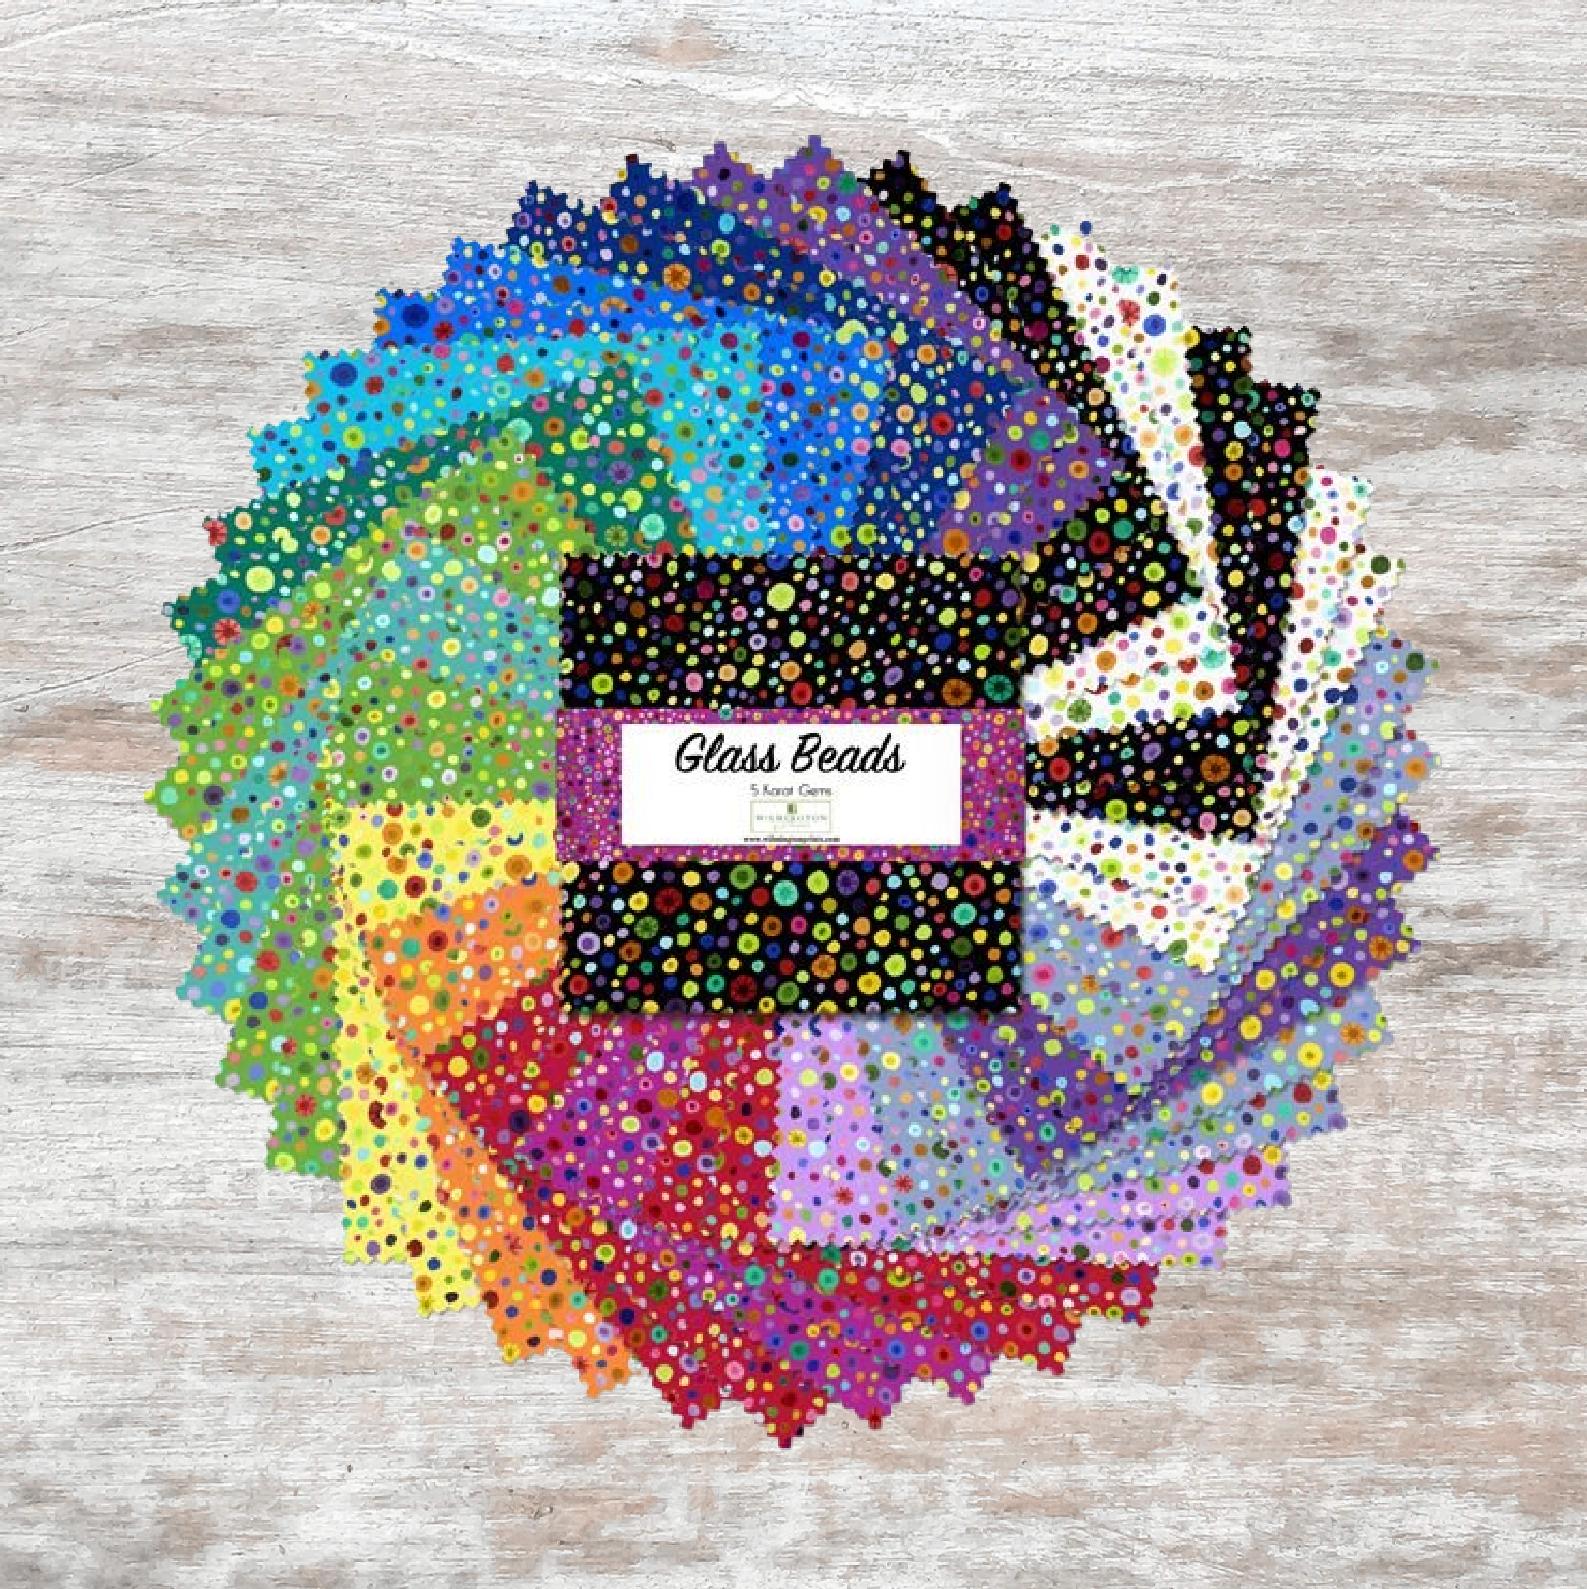 Essentials Glass Beads 5 Karat Gems 5 Squares (42 pcs)